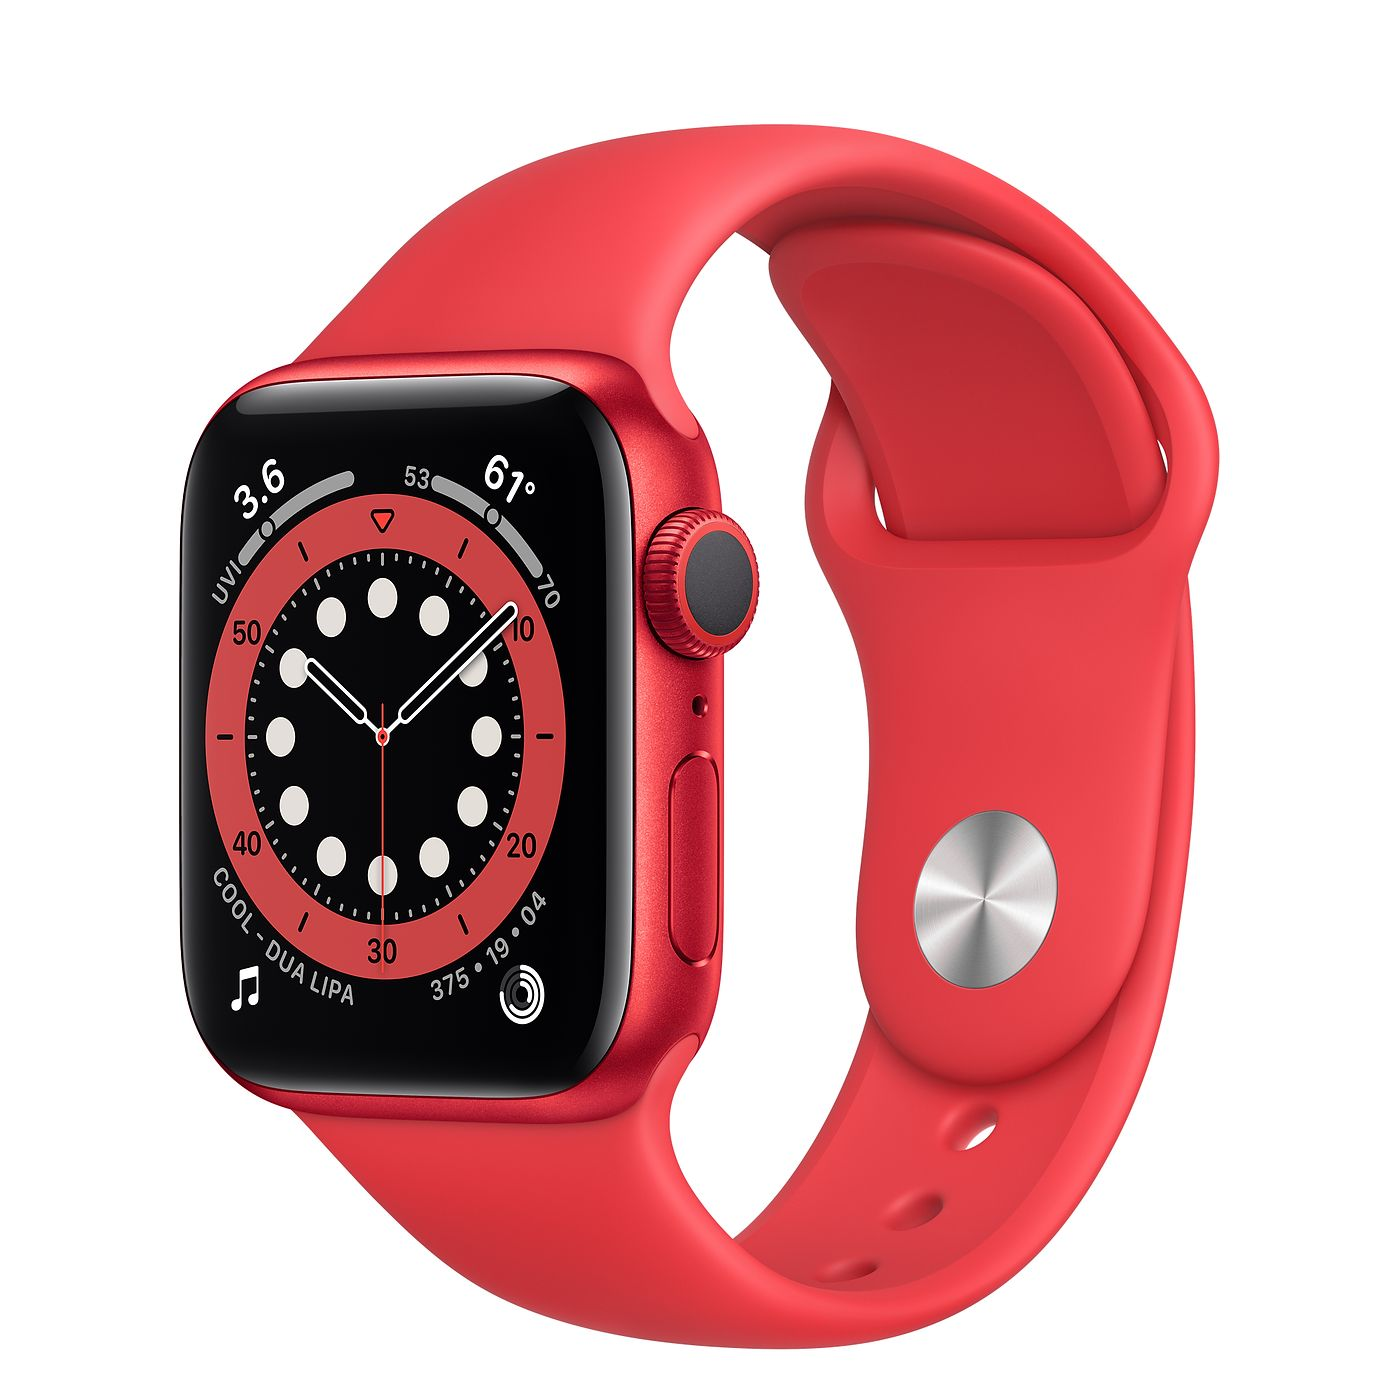 Apple 애플워치 6, GPS, (PRODUCT)RED 알루미늄 케이스, (PRODUCT)RED 스포츠 밴드